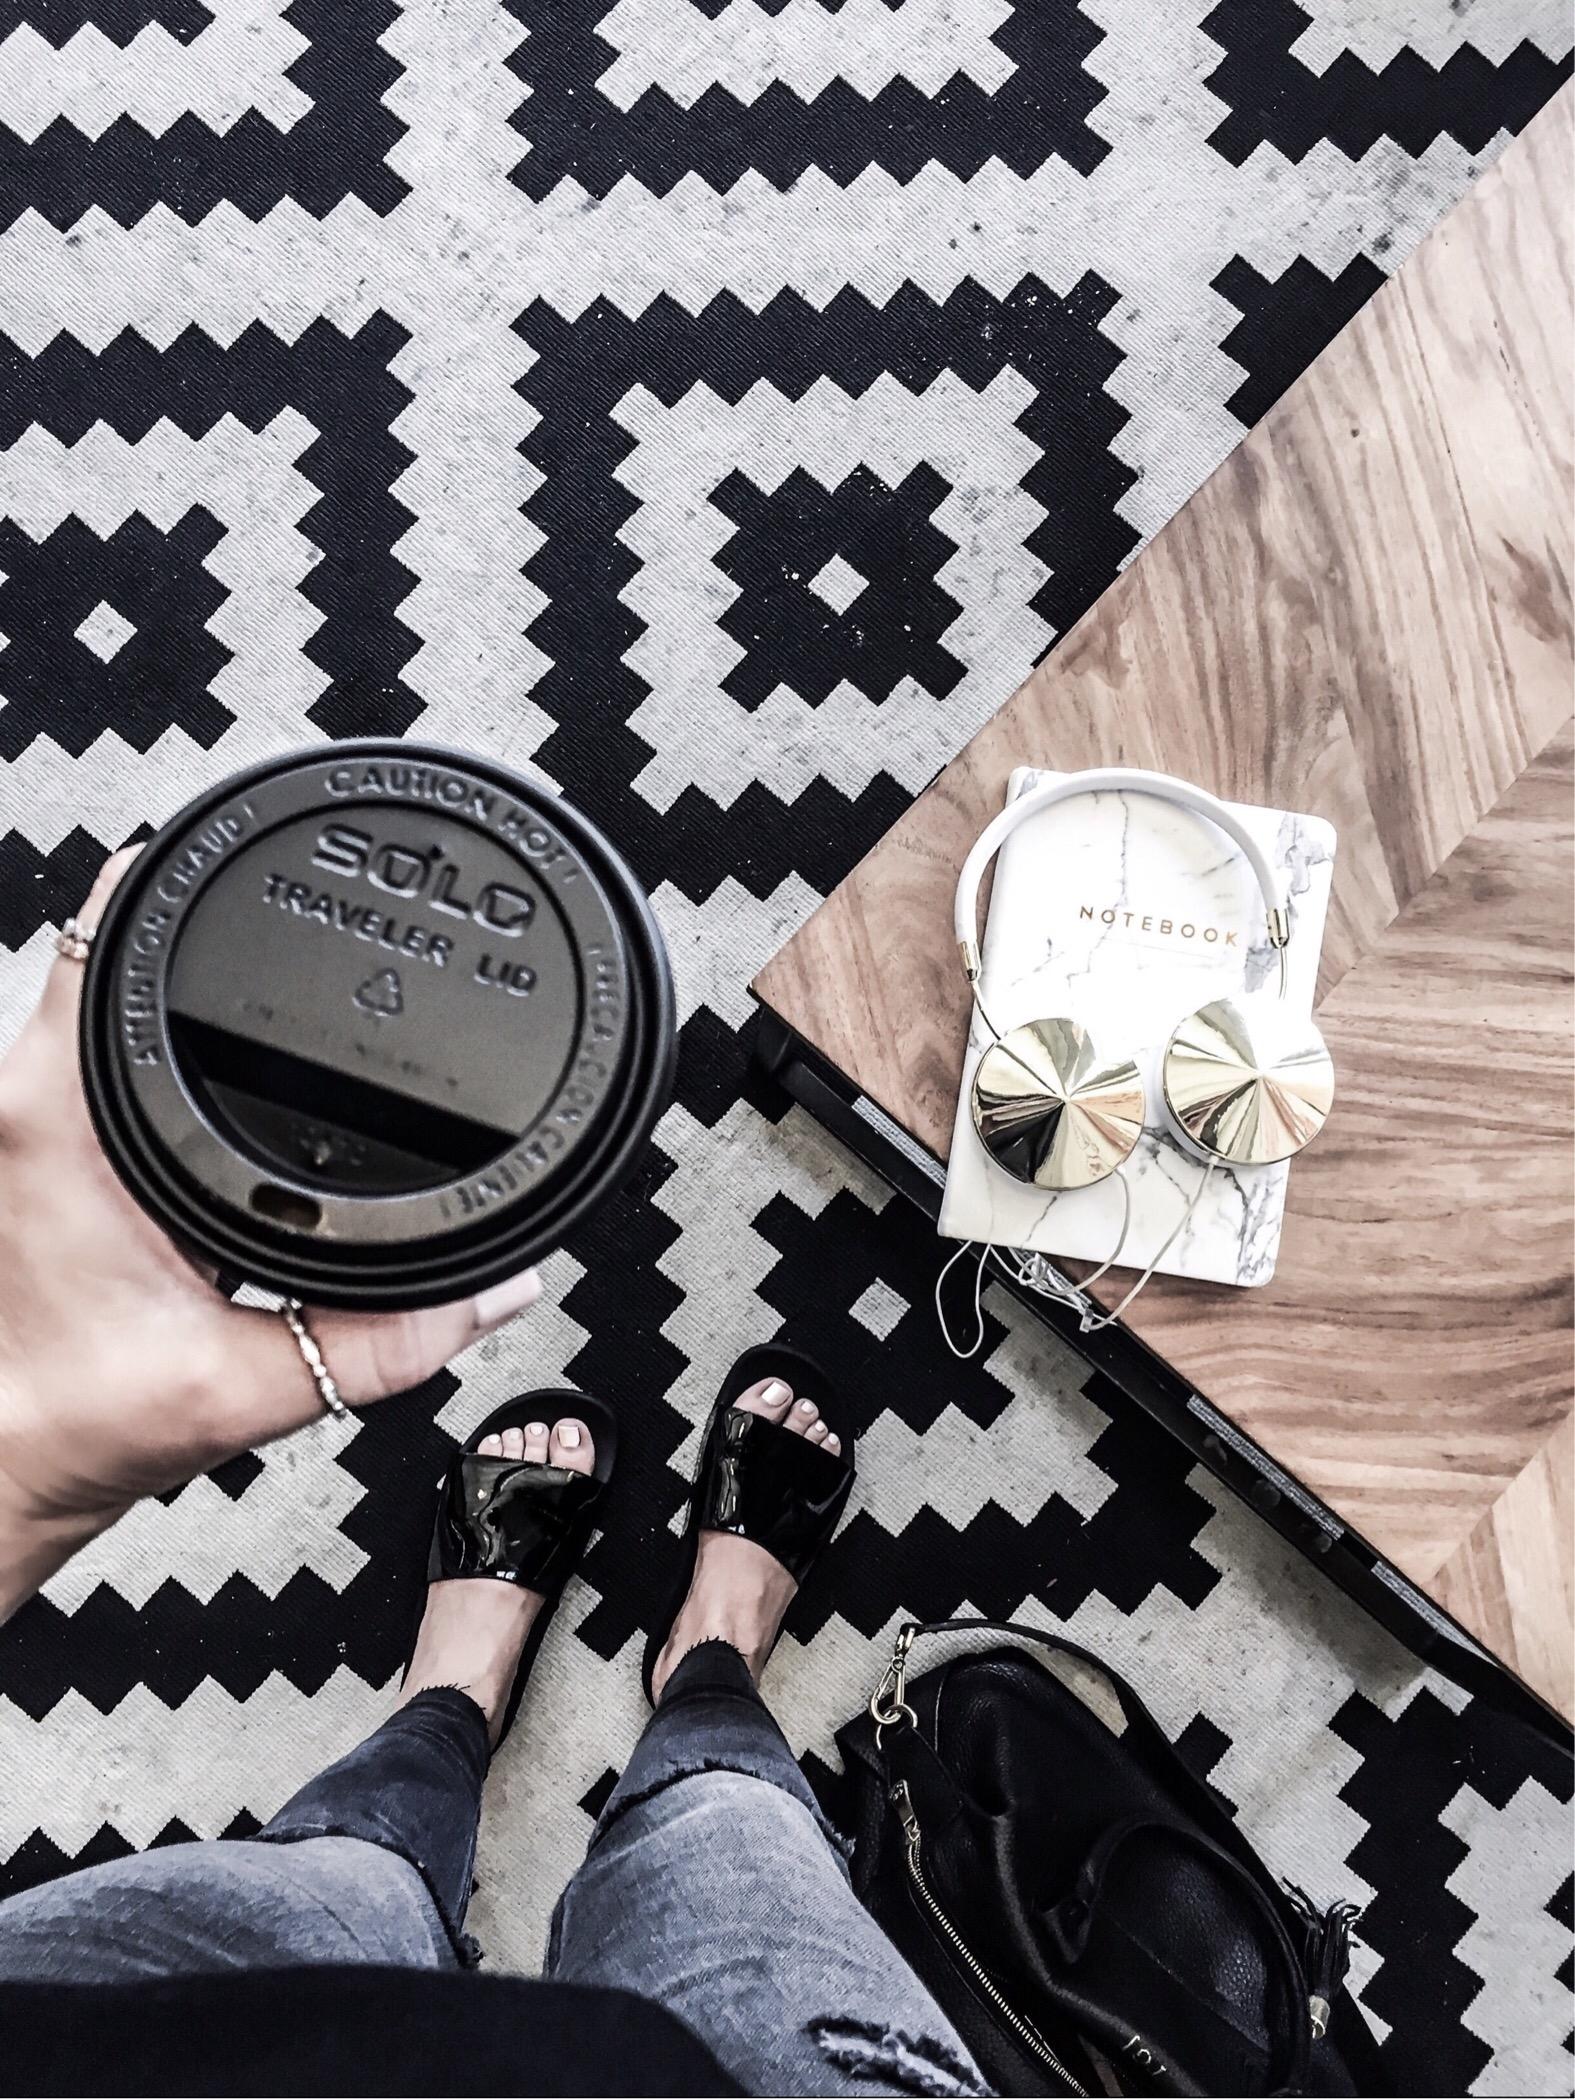 Houston fashion and lifestyle blogger Tiffany Jais | Black slides, flatlay, fashion flatlays, frends headphones | coffee shop vibes